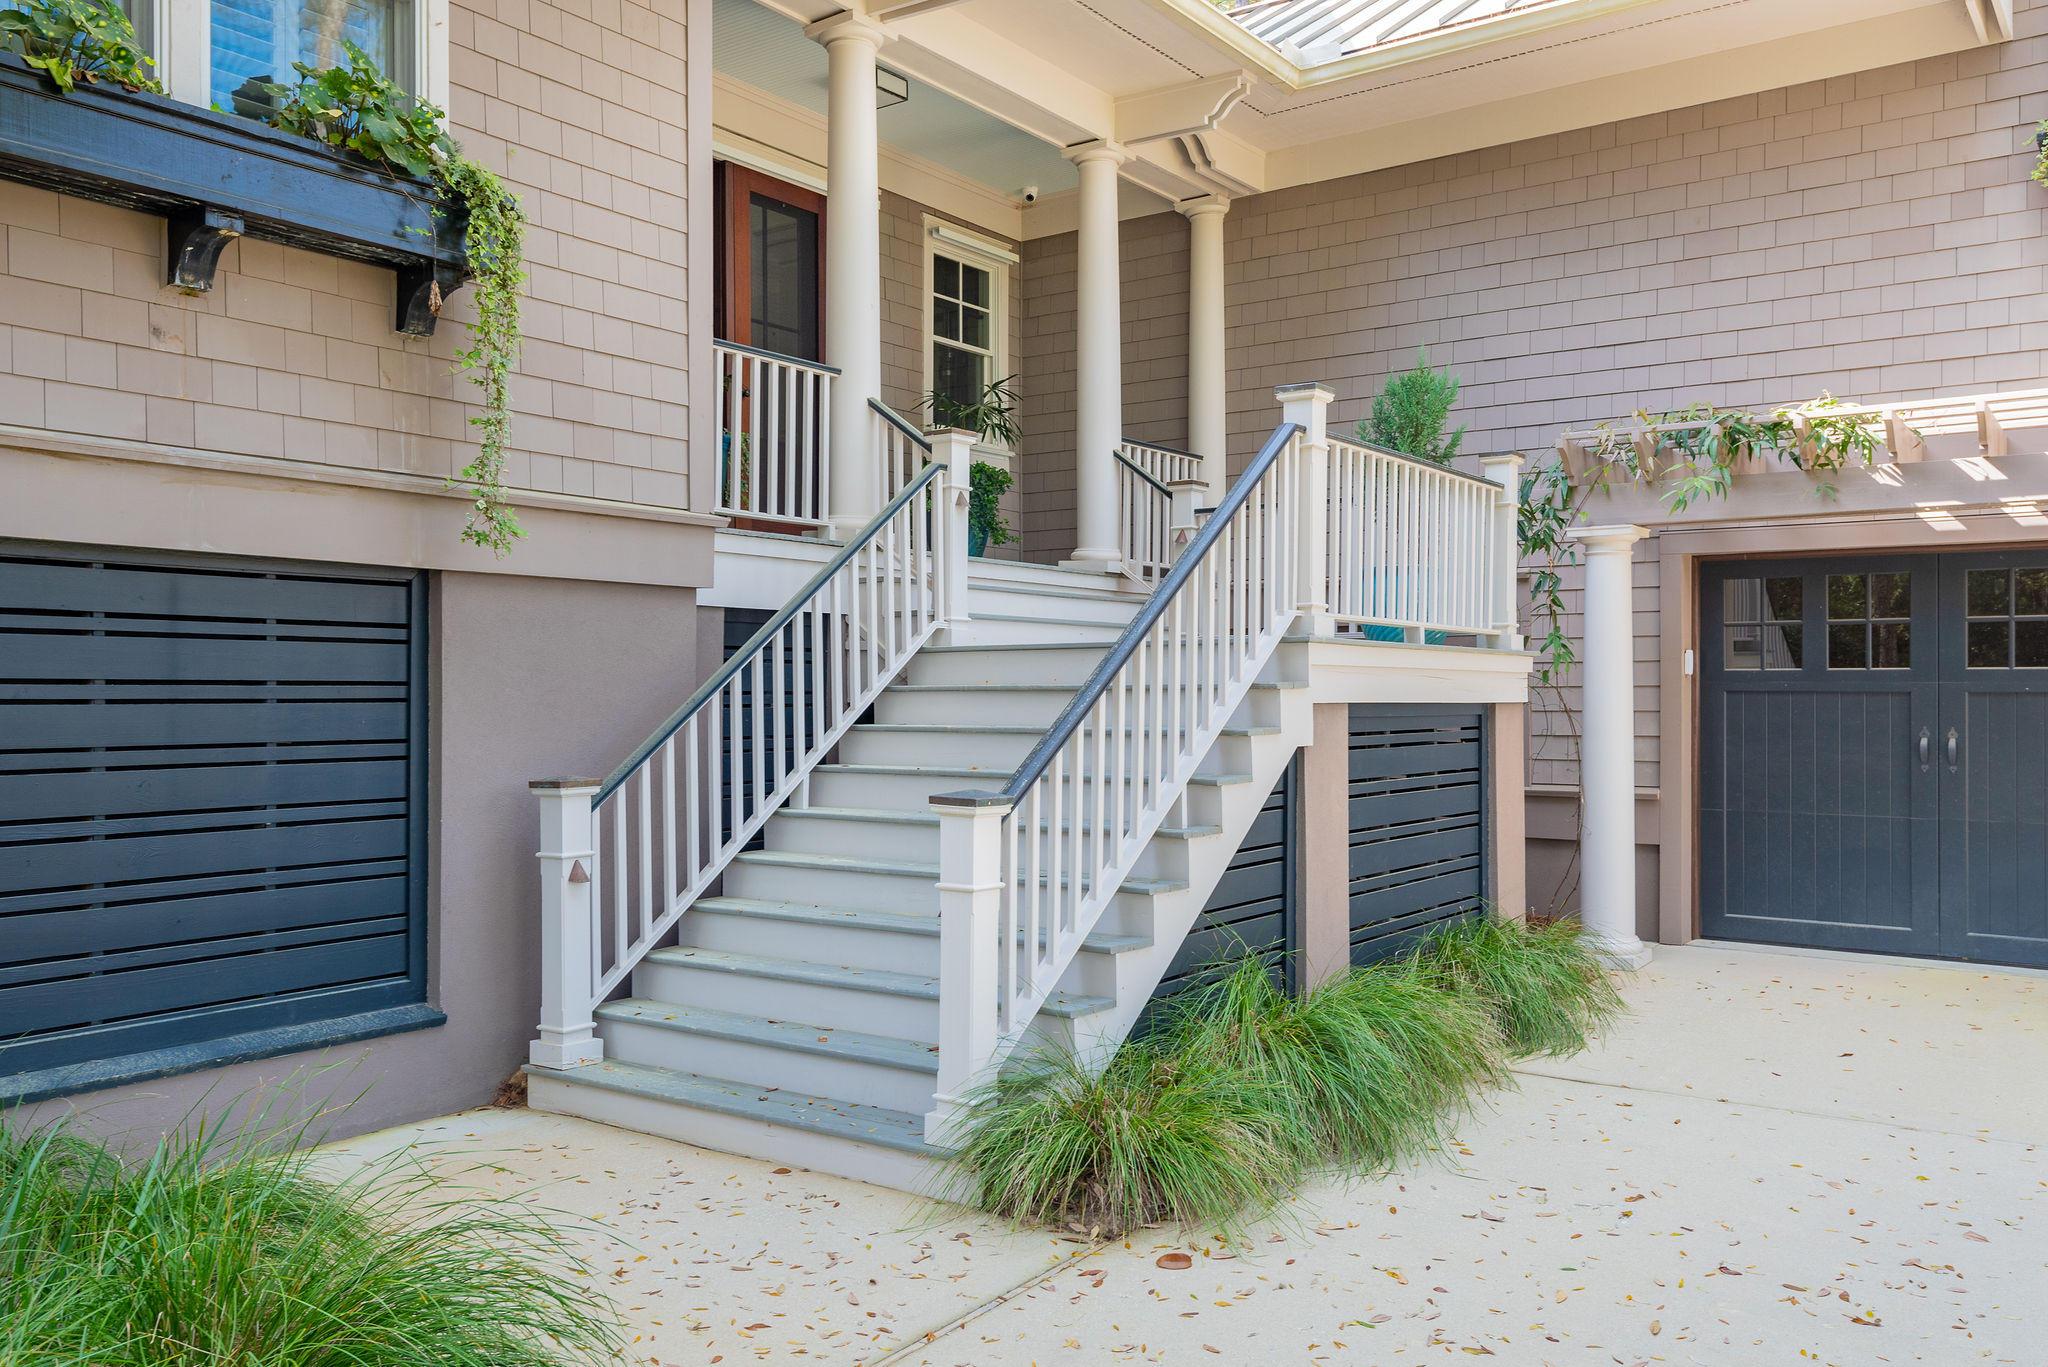 Kiawah Island Homes For Sale - 3 Grey Widgeon, Kiawah Island, SC - 48